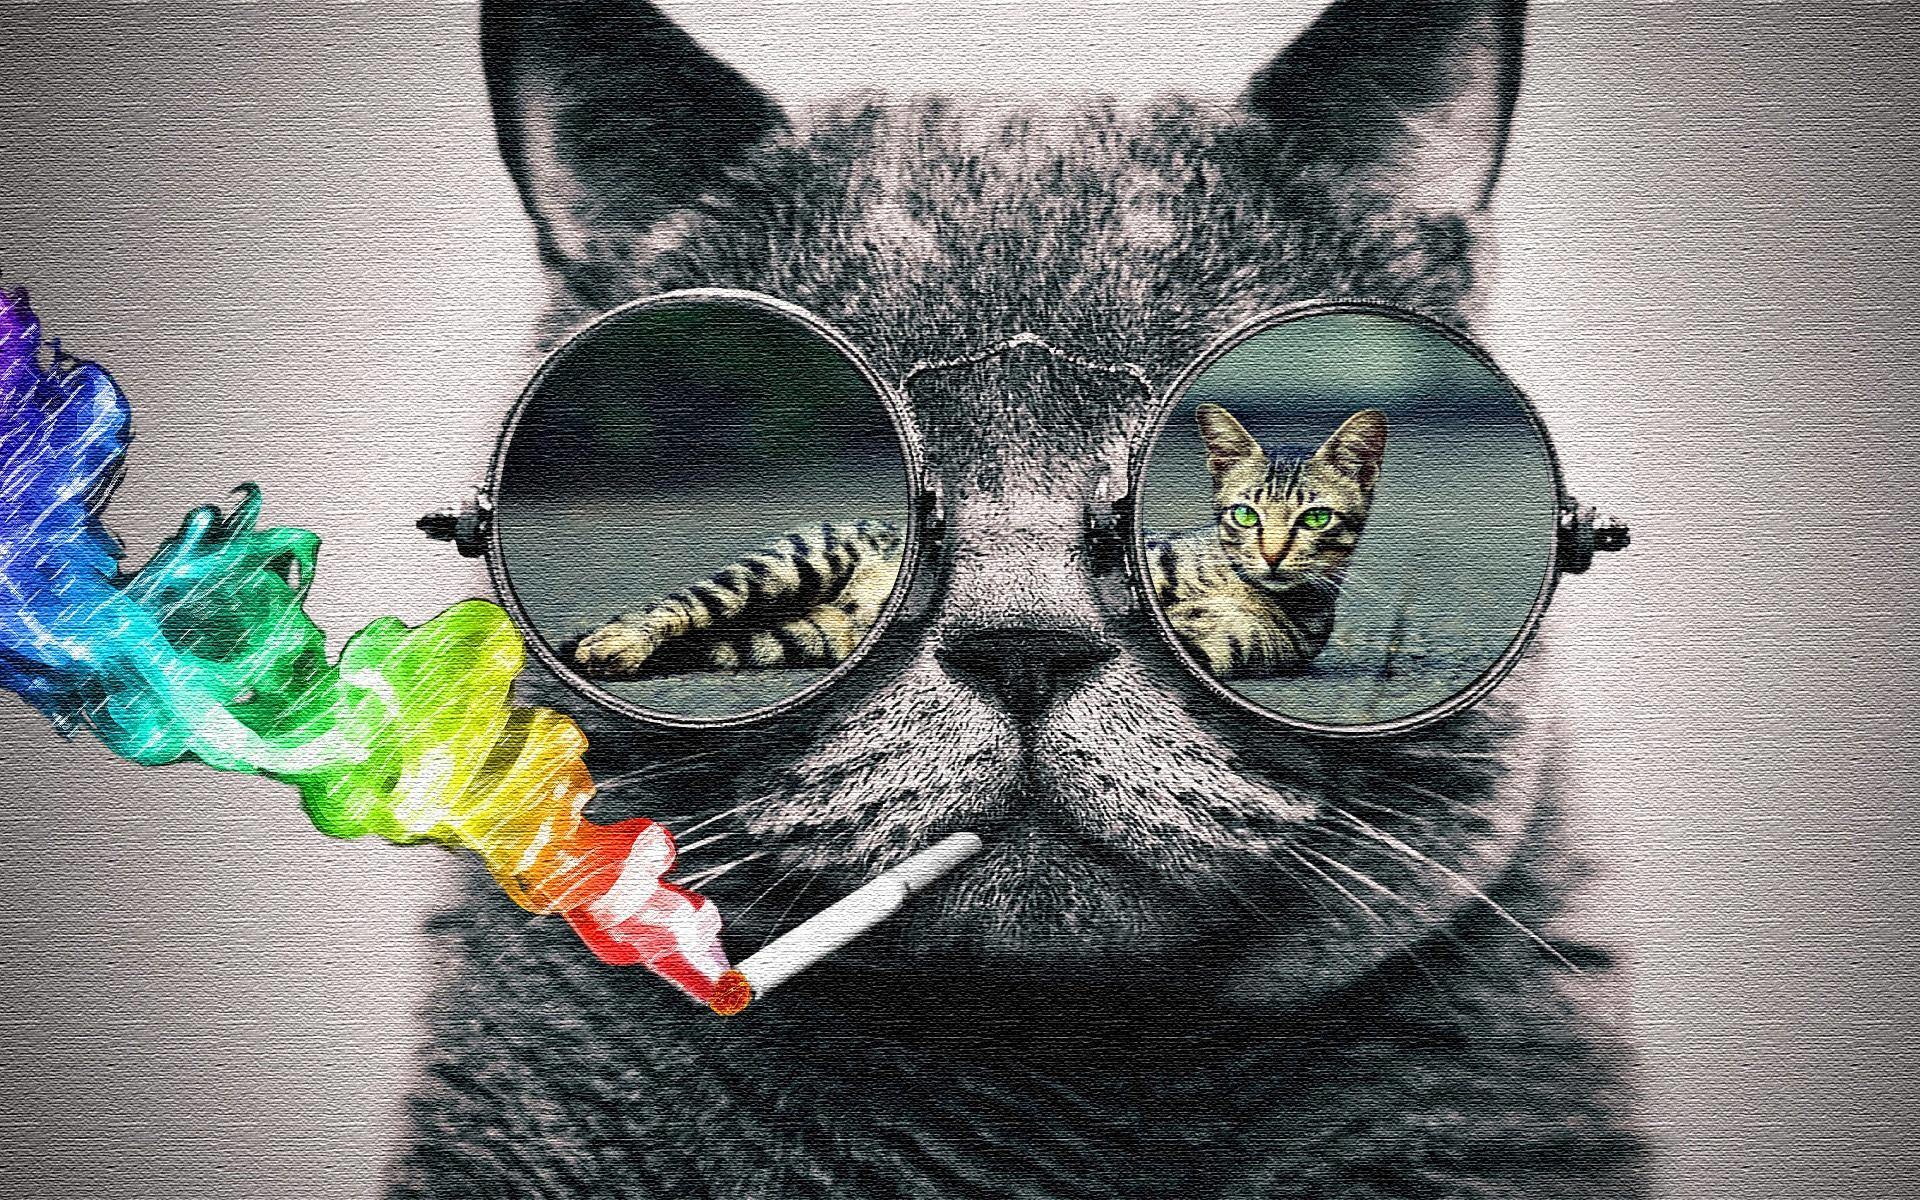 Cat with sunglasses wallpaper (Photoshop) - rank them please 1920x1200